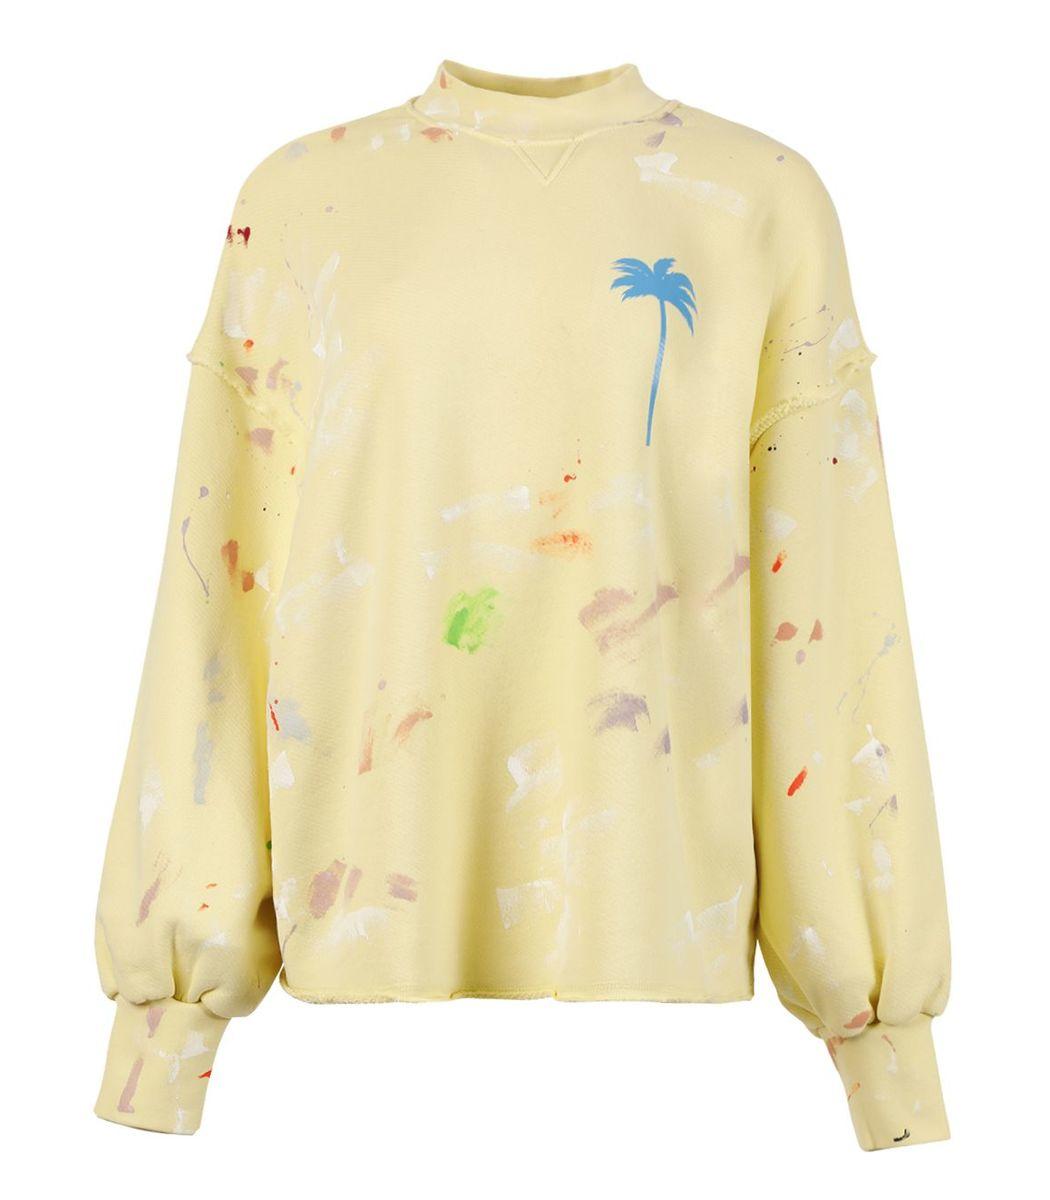 Palm Angels Pxp Painted Crewneck Sweatshirt, Baby Yellow